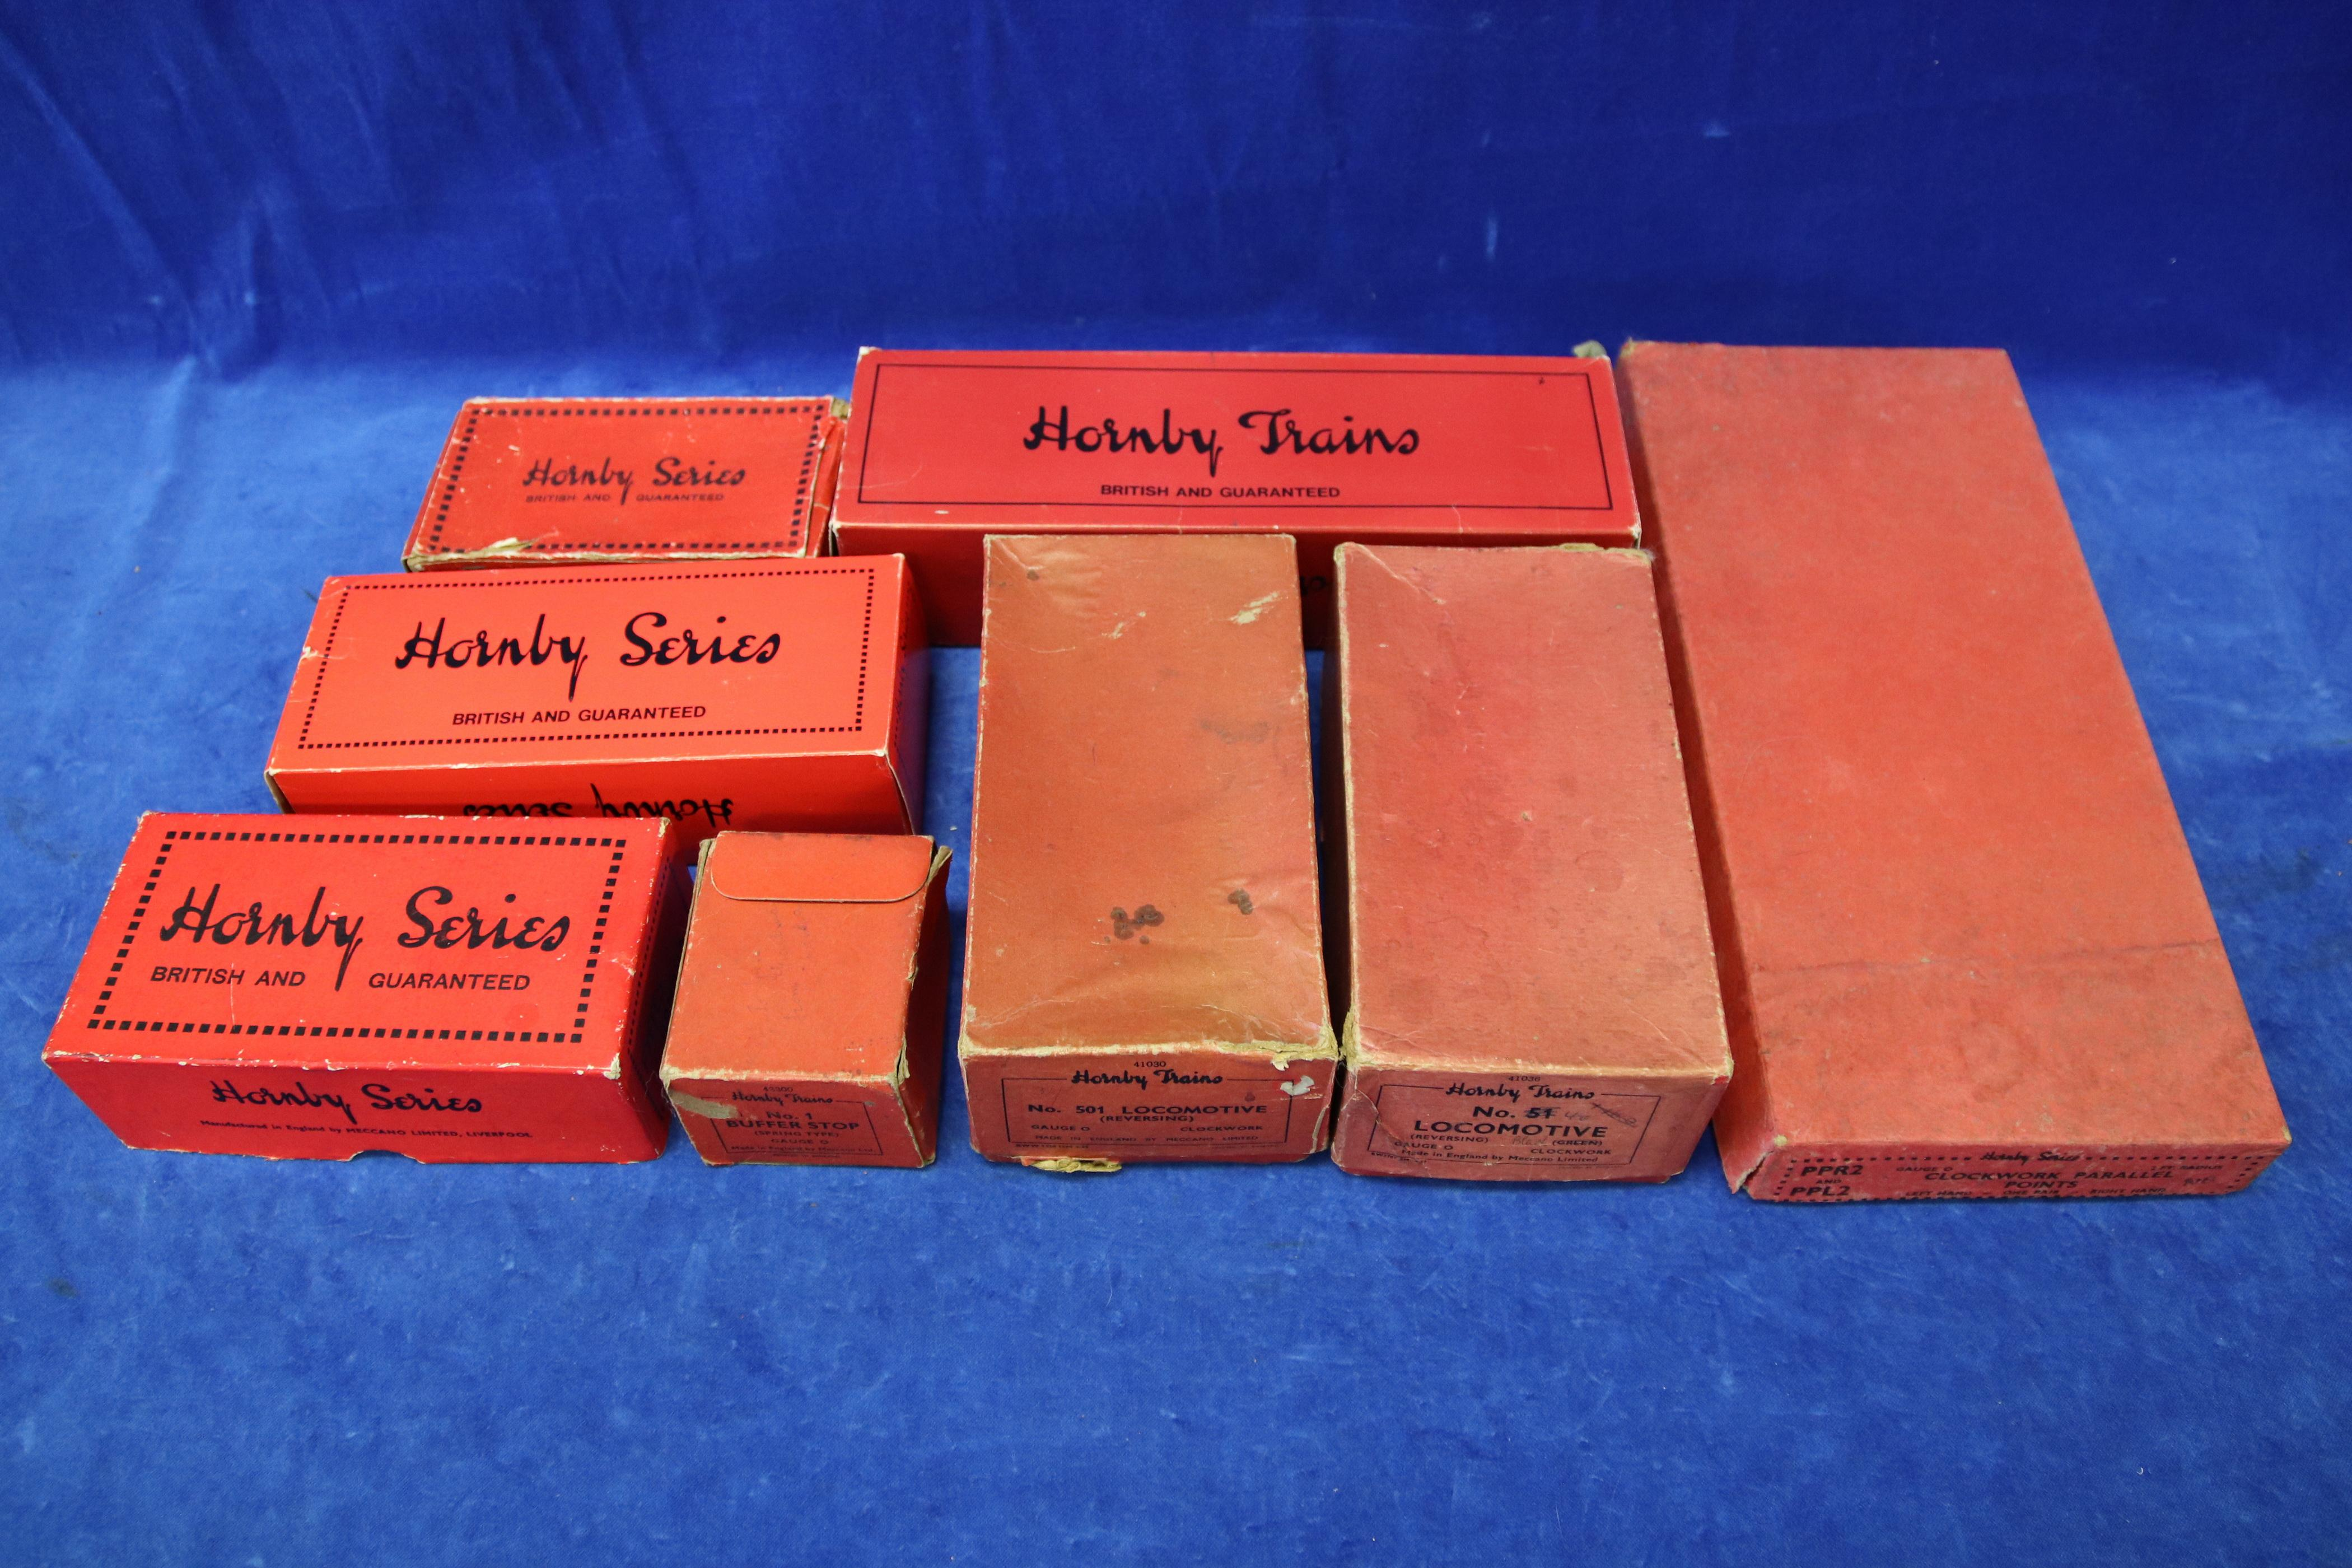 6 EMPTY HORNBY TRAIN BOXES AND 1 EMPTY MECCANO BOX